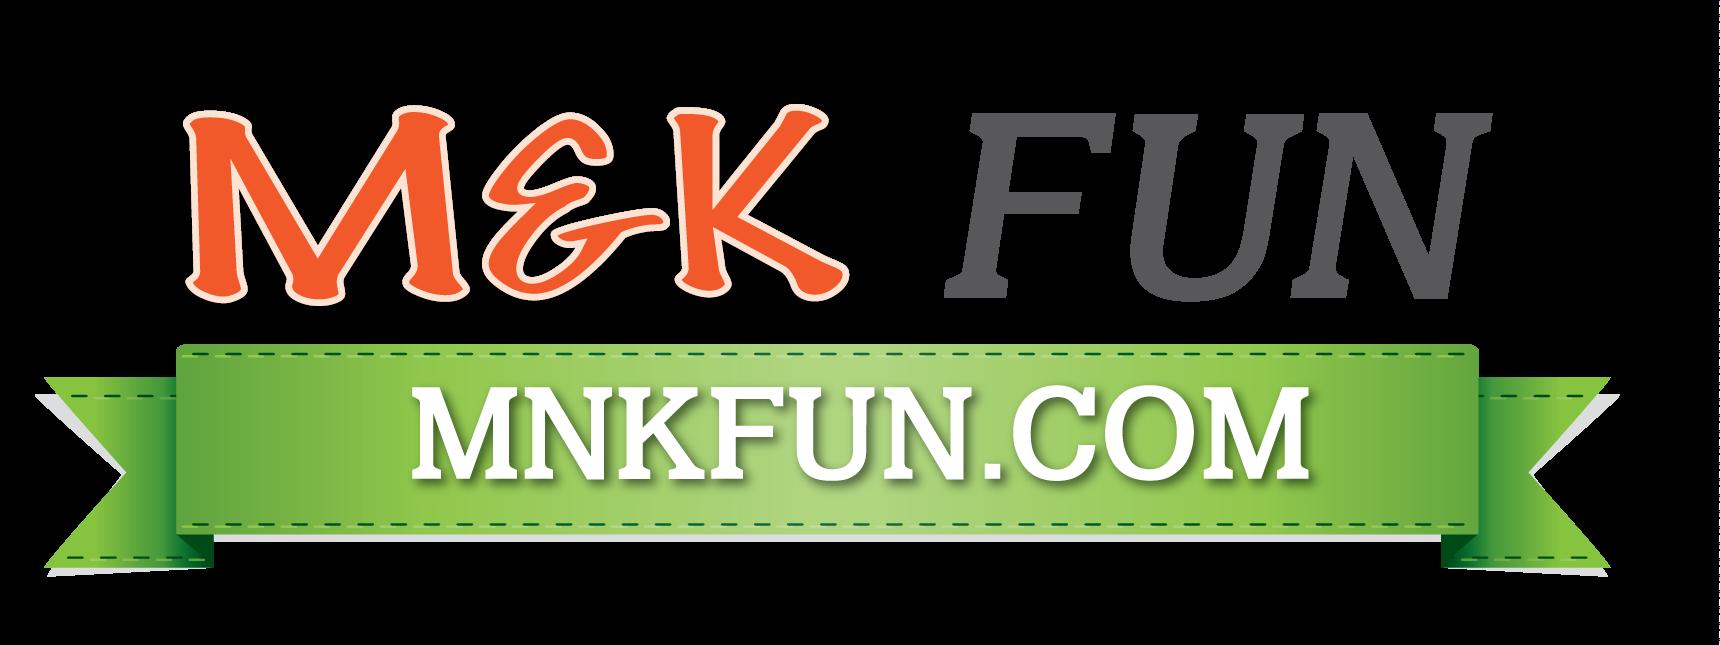 mnkfun_logo_banner_ottls